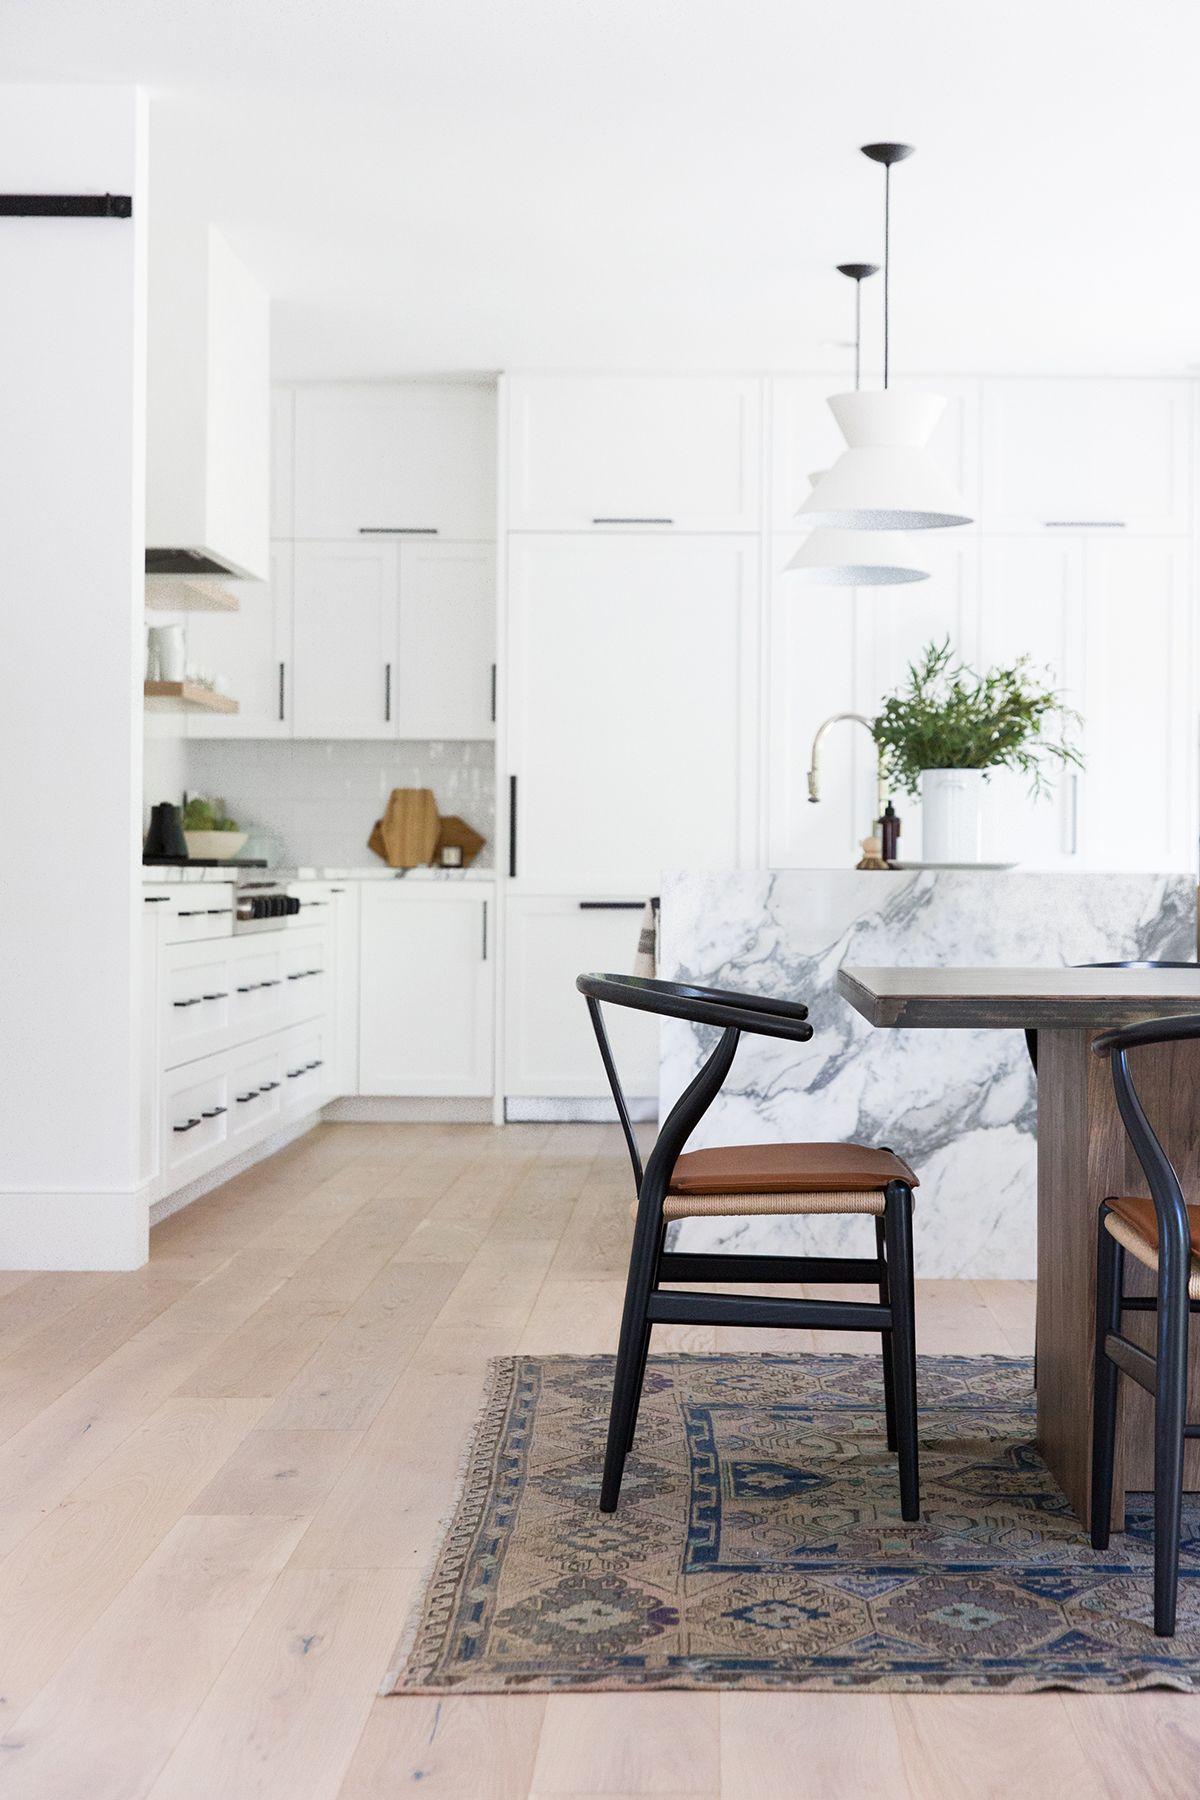 mercer island kitchen dining photo tour in 2019 studio mcgee rh pinterest com